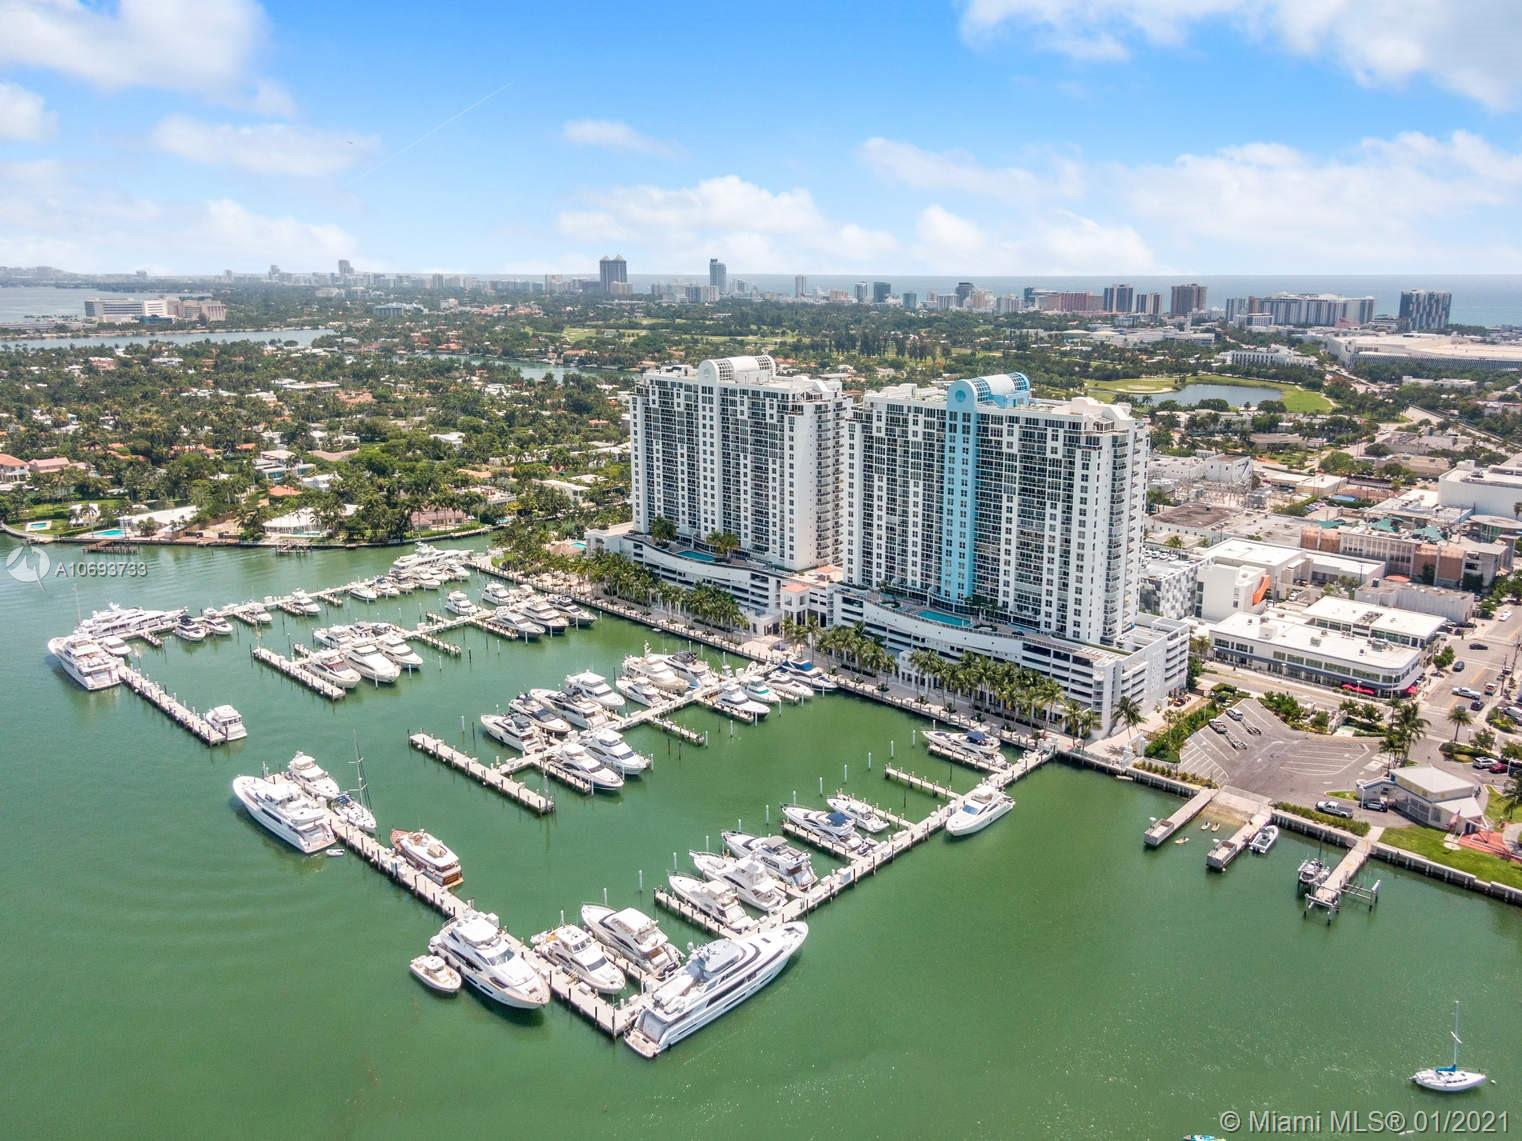 1800  Sunset Harbour Dr #1501 For Sale A10693733, FL